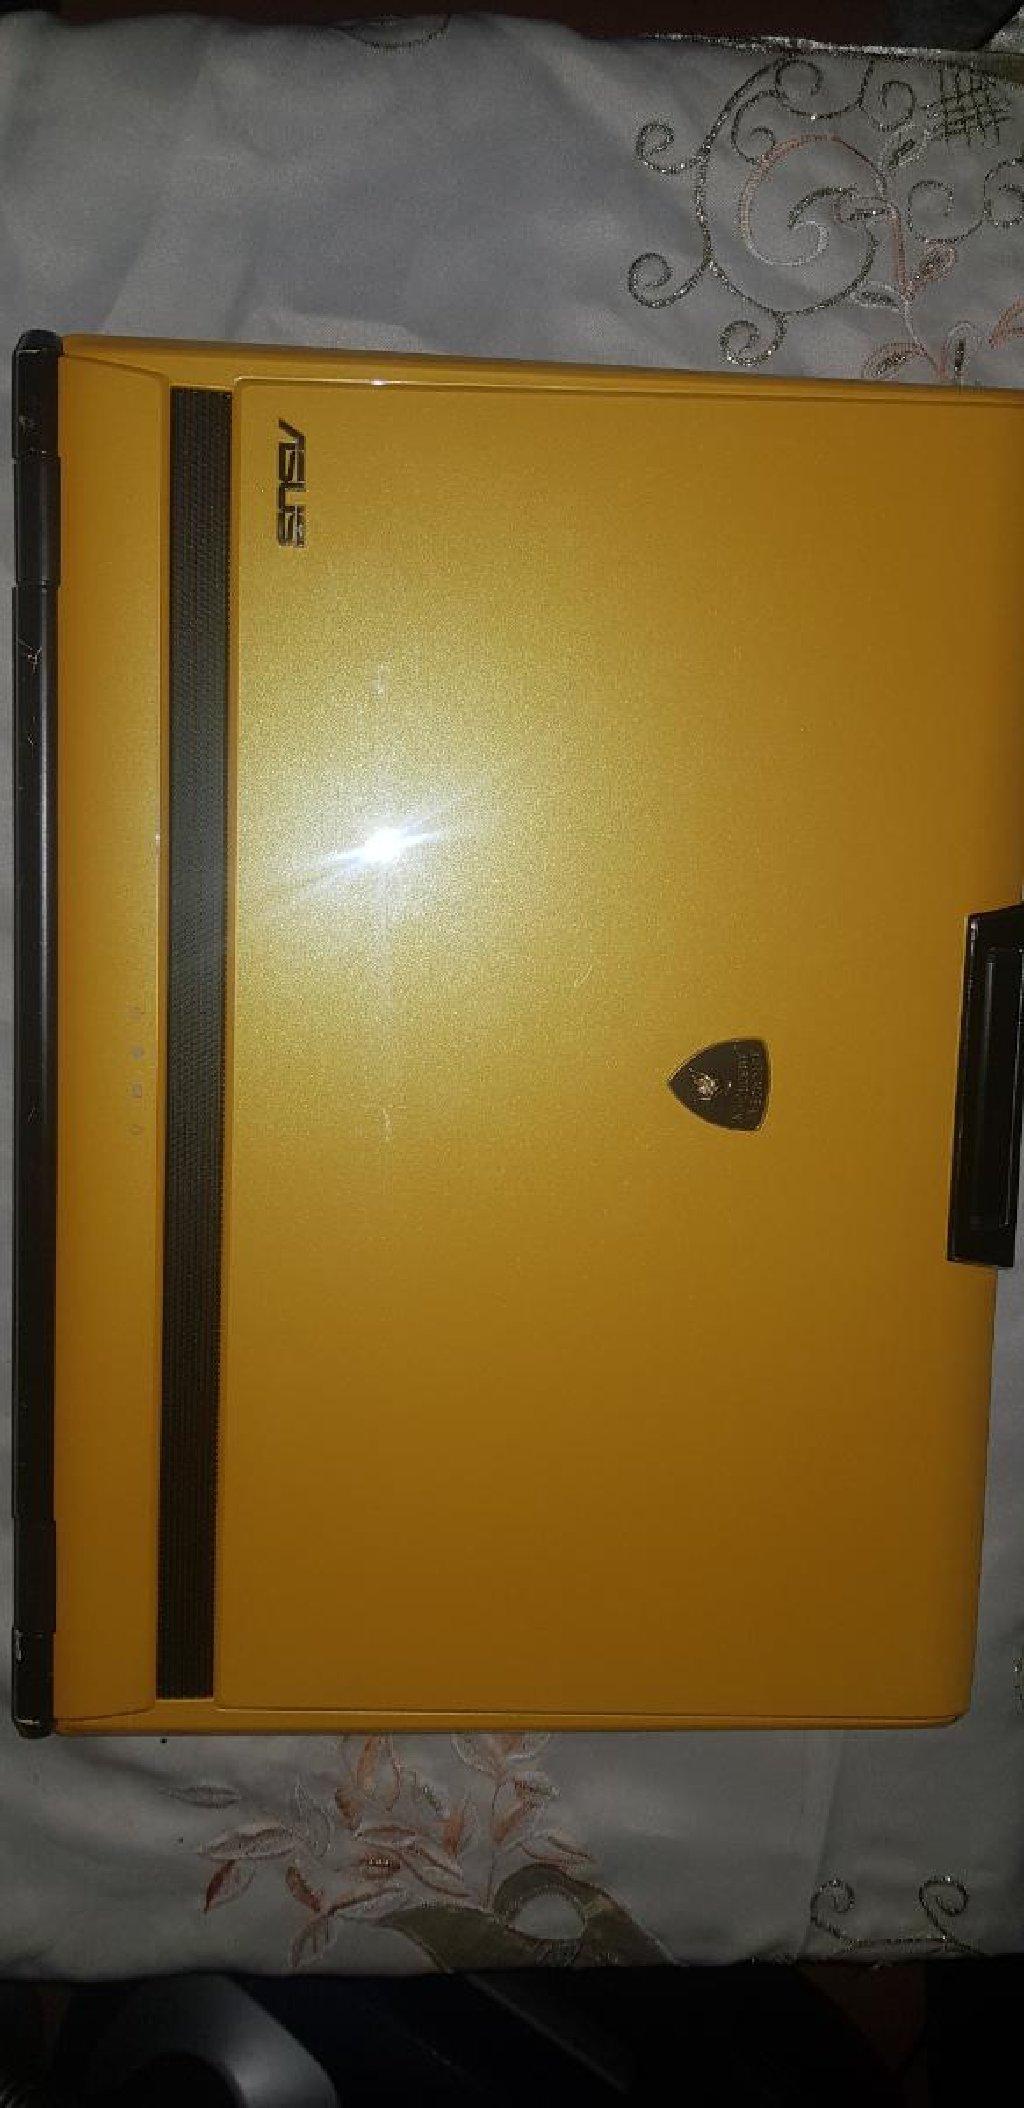 Asus lamborghini laptop žute boje iznad i ispod testatura nalazi se koža animacije, materijal:alkantare